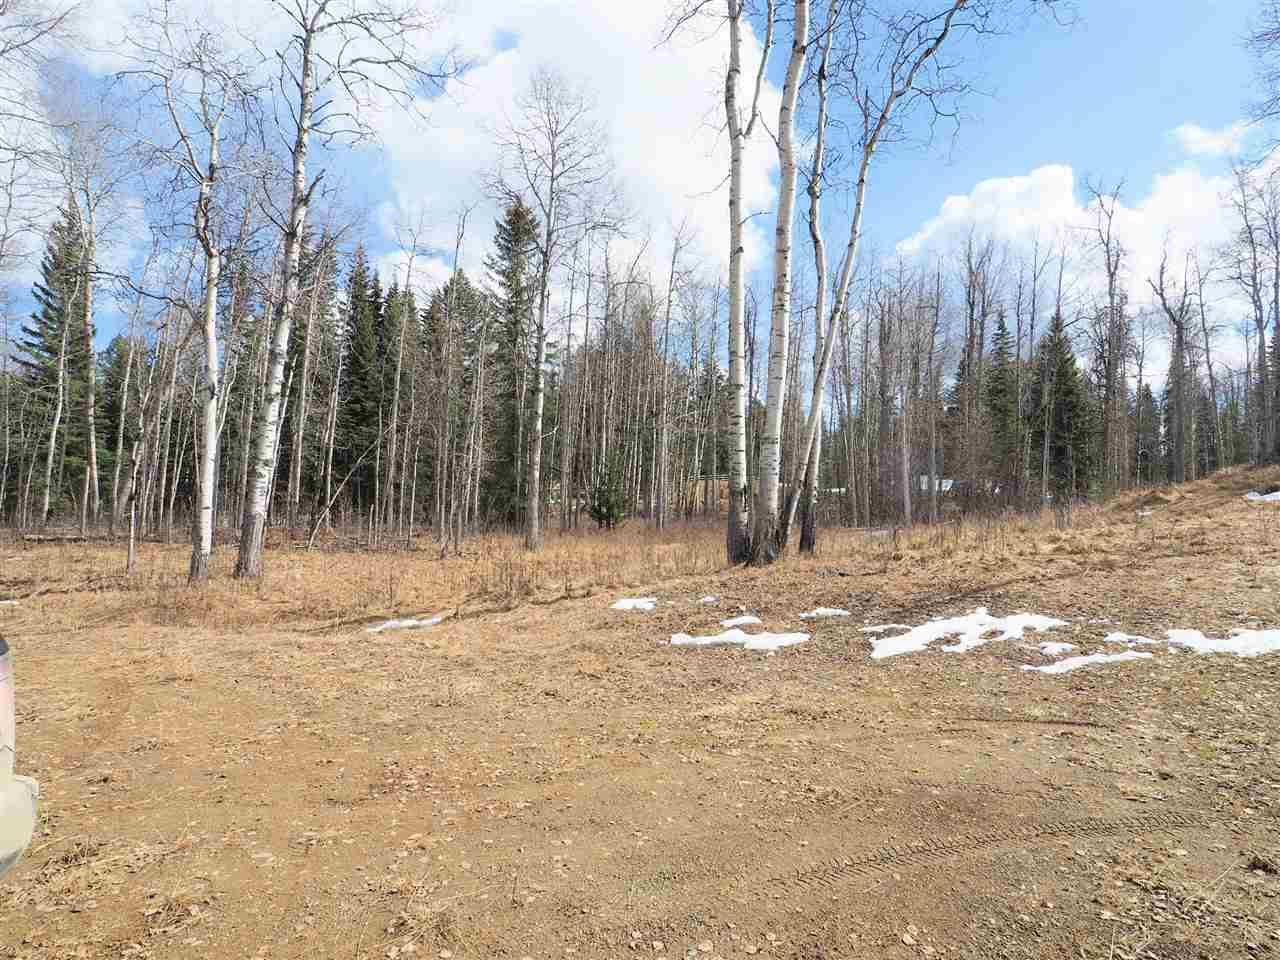 Main Photo: LOT C LITTLE FORT 24 Highway in Bridge Lake: Bridge Lake/Sheridan Lake Land for sale (100 Mile House (Zone 10))  : MLS®# R2092235